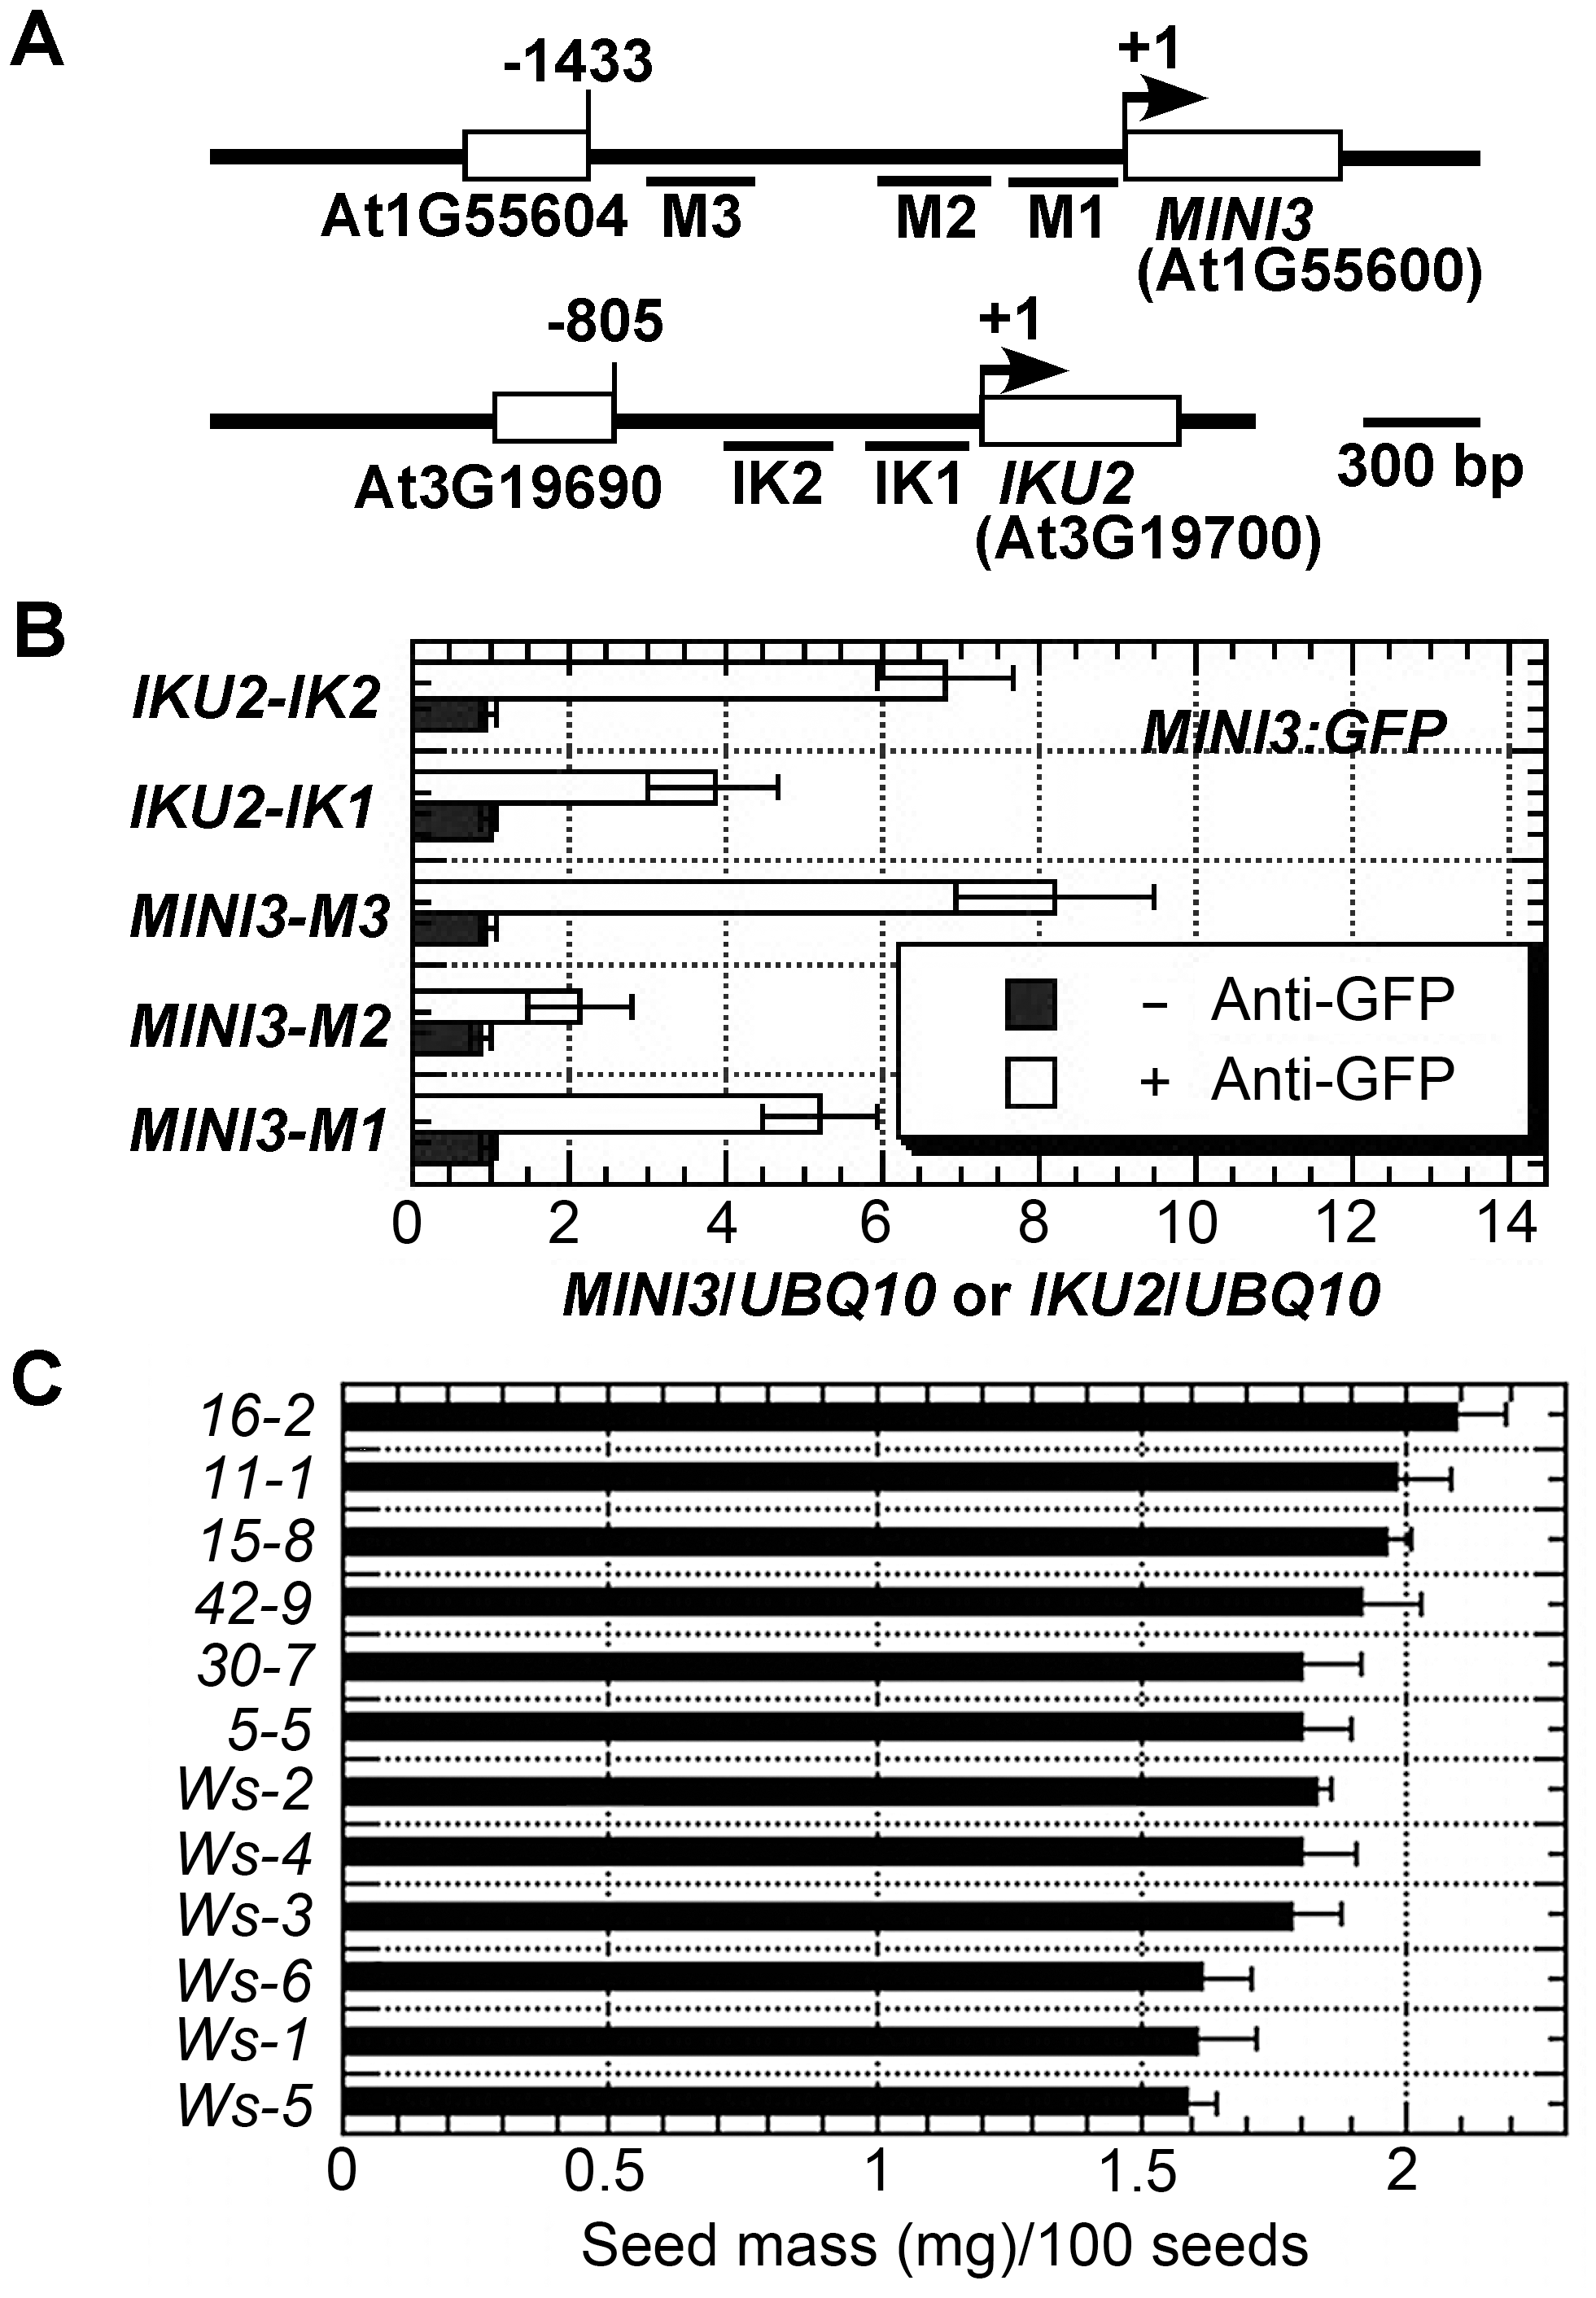 MINI3 ChIPs to the promoters of <i>MINI3</i> and <i>IKU2</i>.